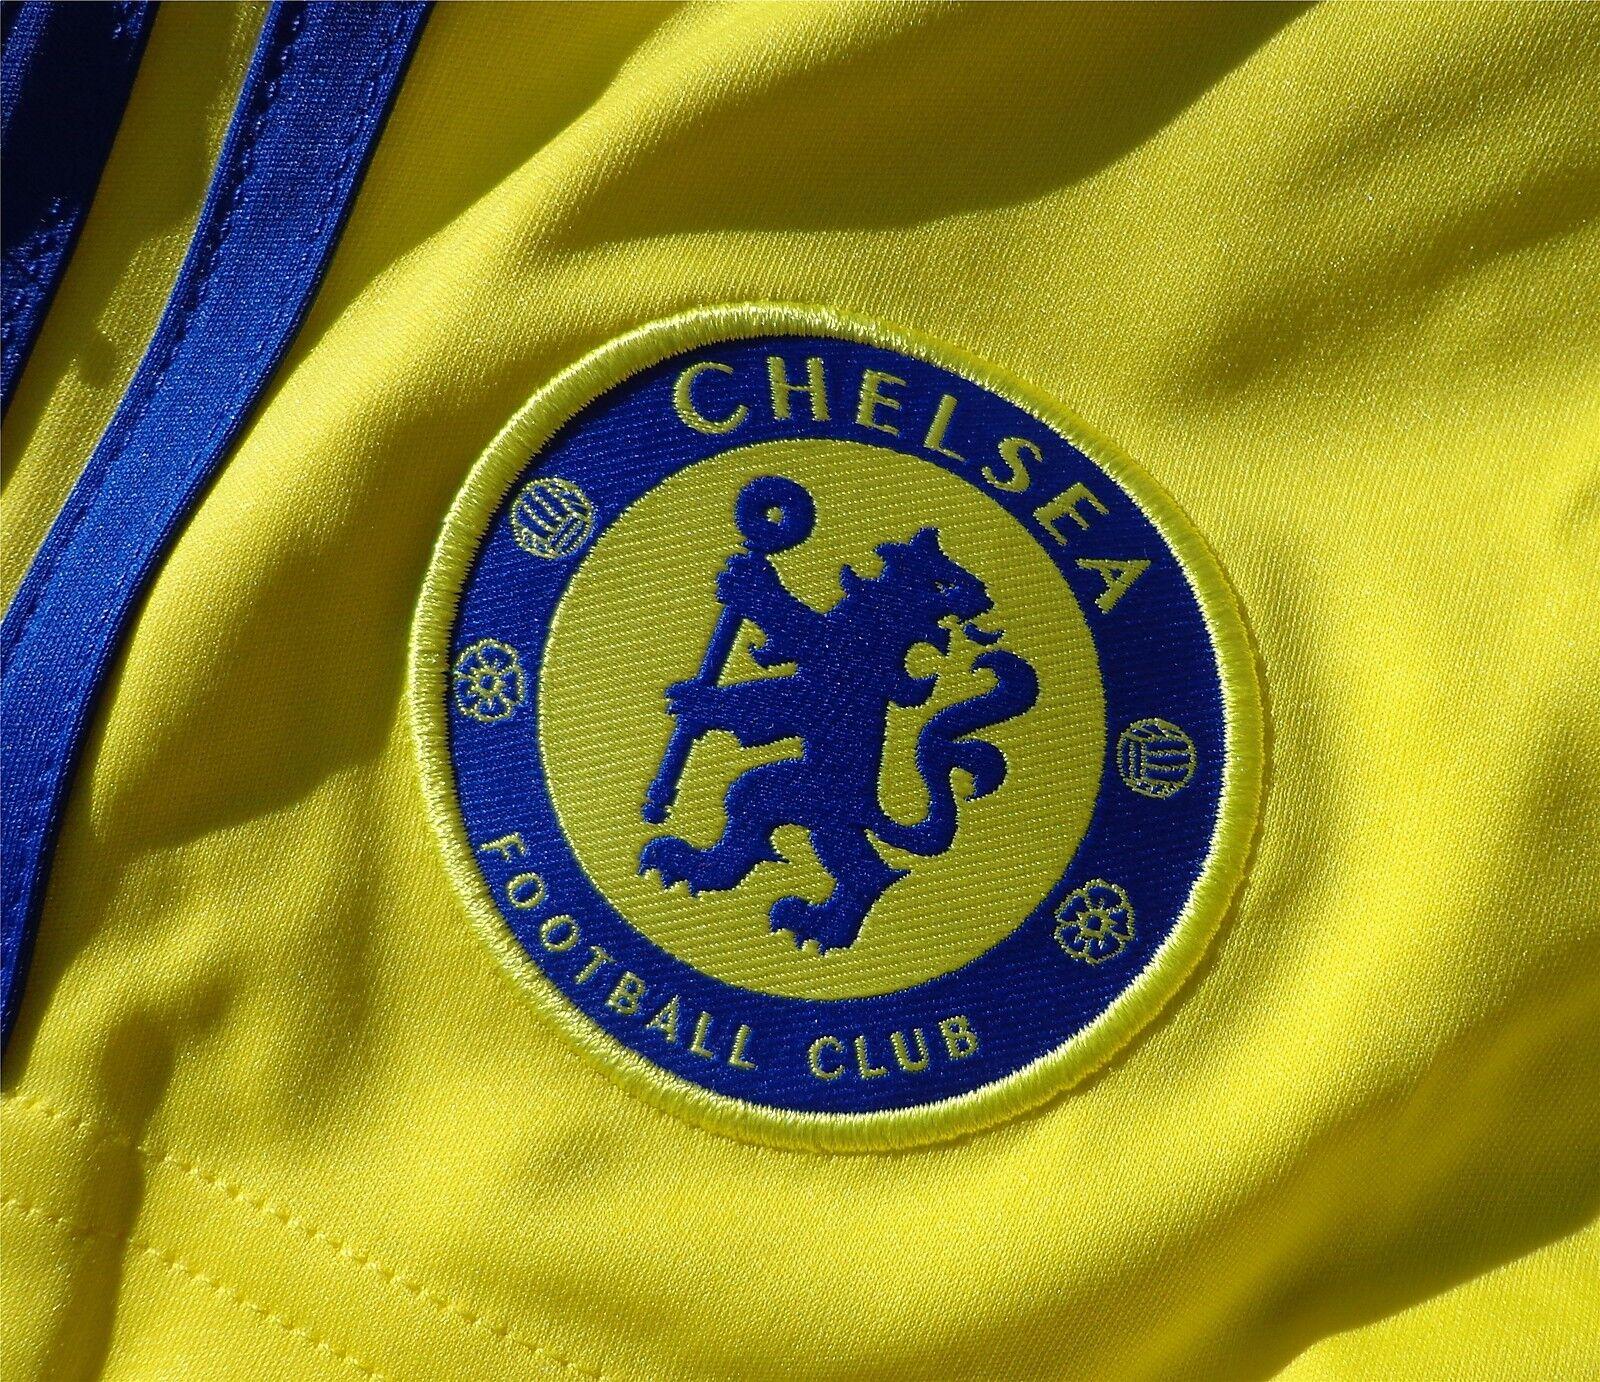 Chelsea London short court-KIDS/ENFANTS ADIDAS pantalon court-KIDS/ENFANTS short 128-176 JAUNE FLUO NOUVEAU CFC f1735f